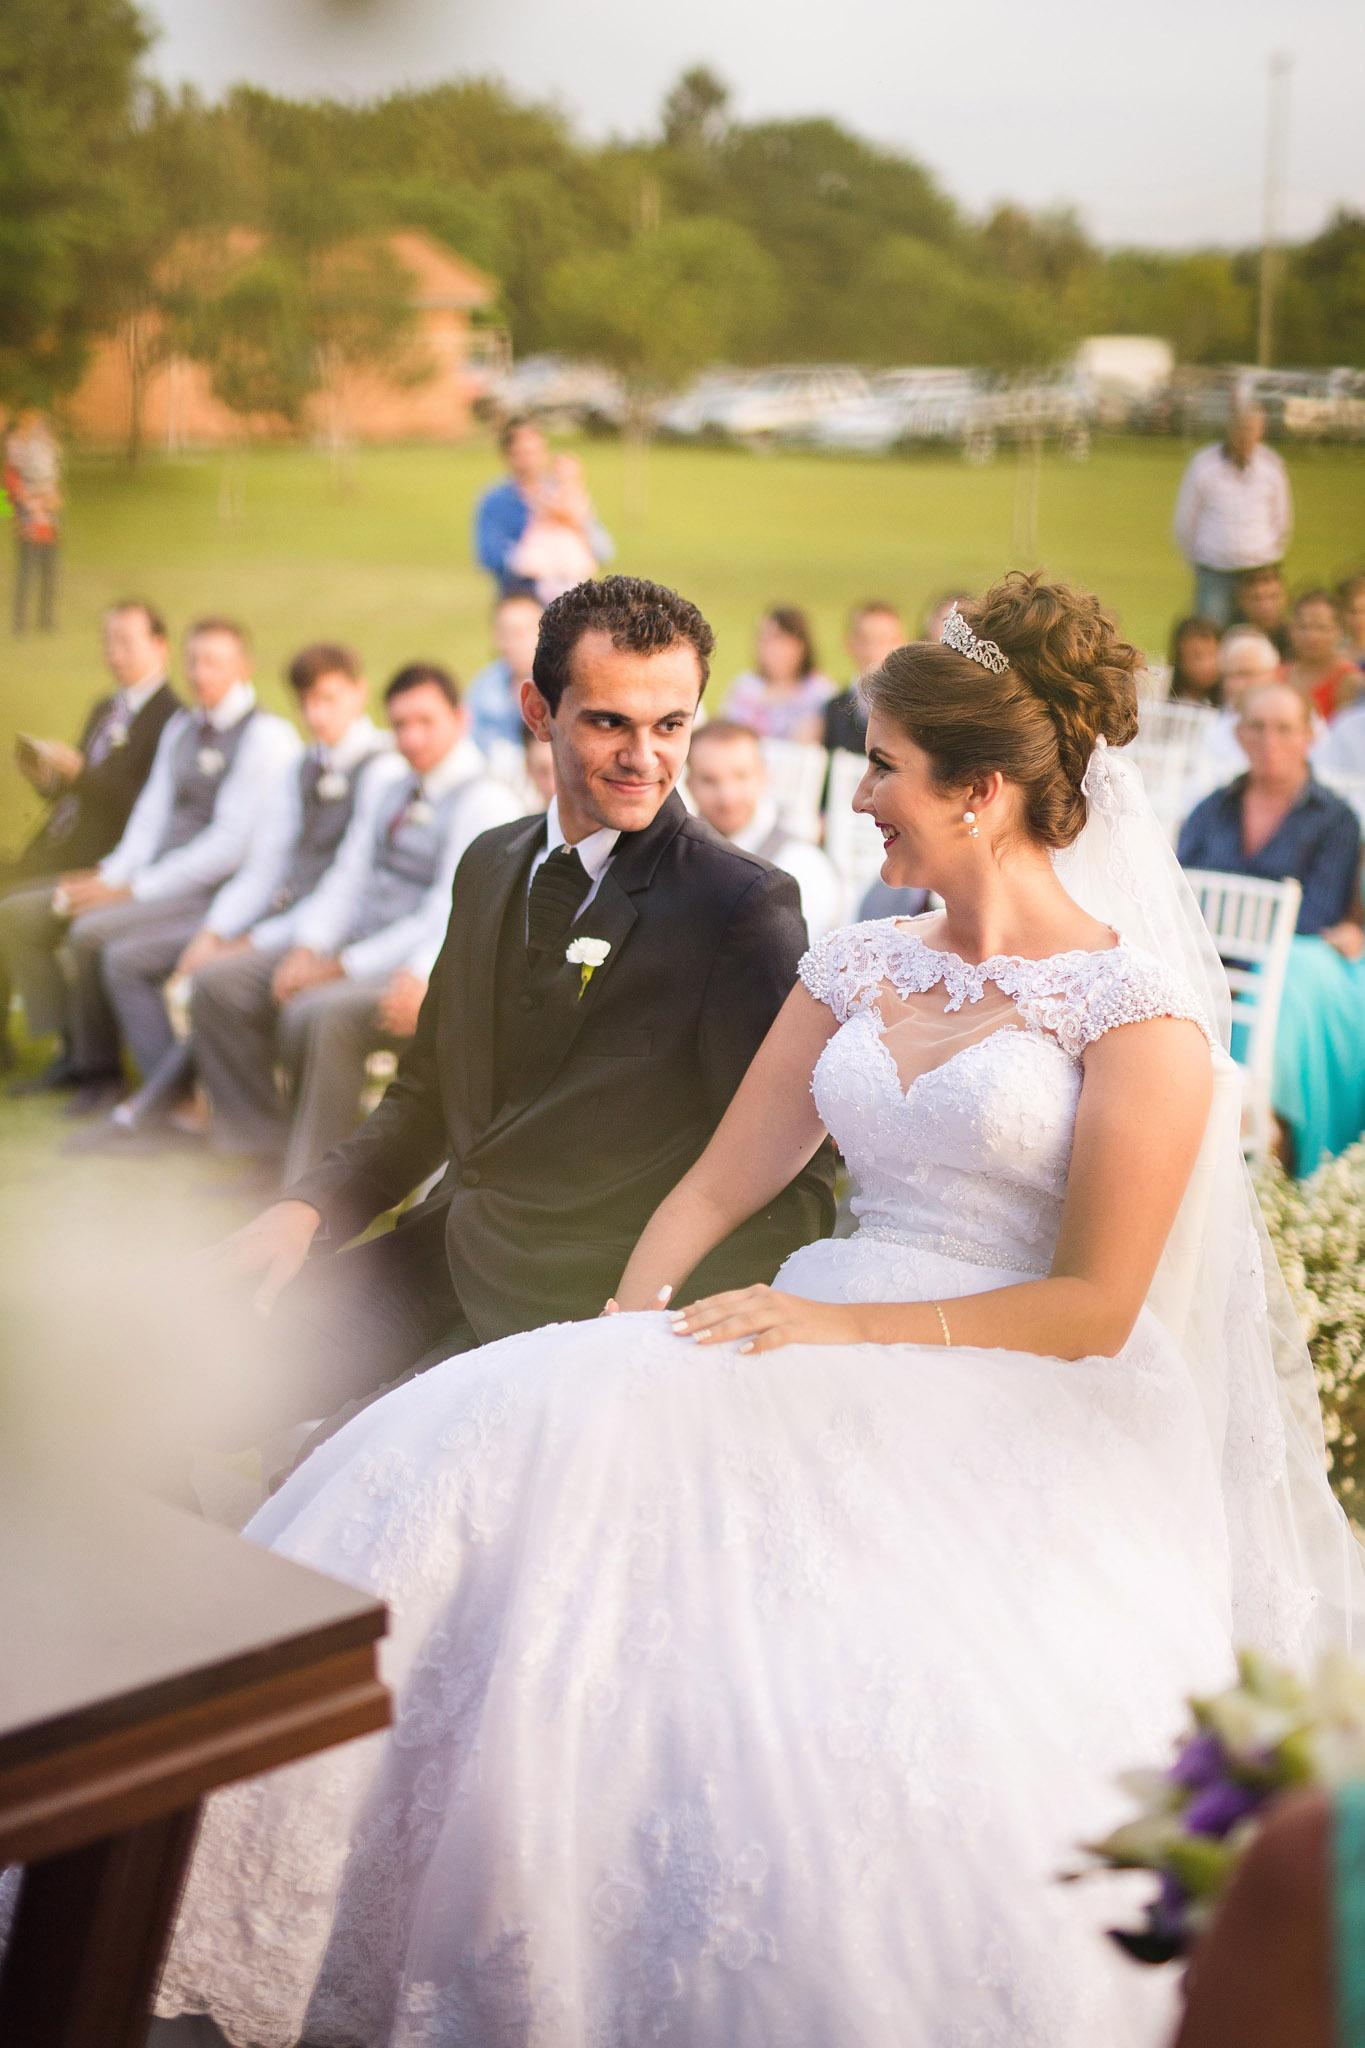 Wedding_Travellers_Destination_Wedding_Photography-103.jpg